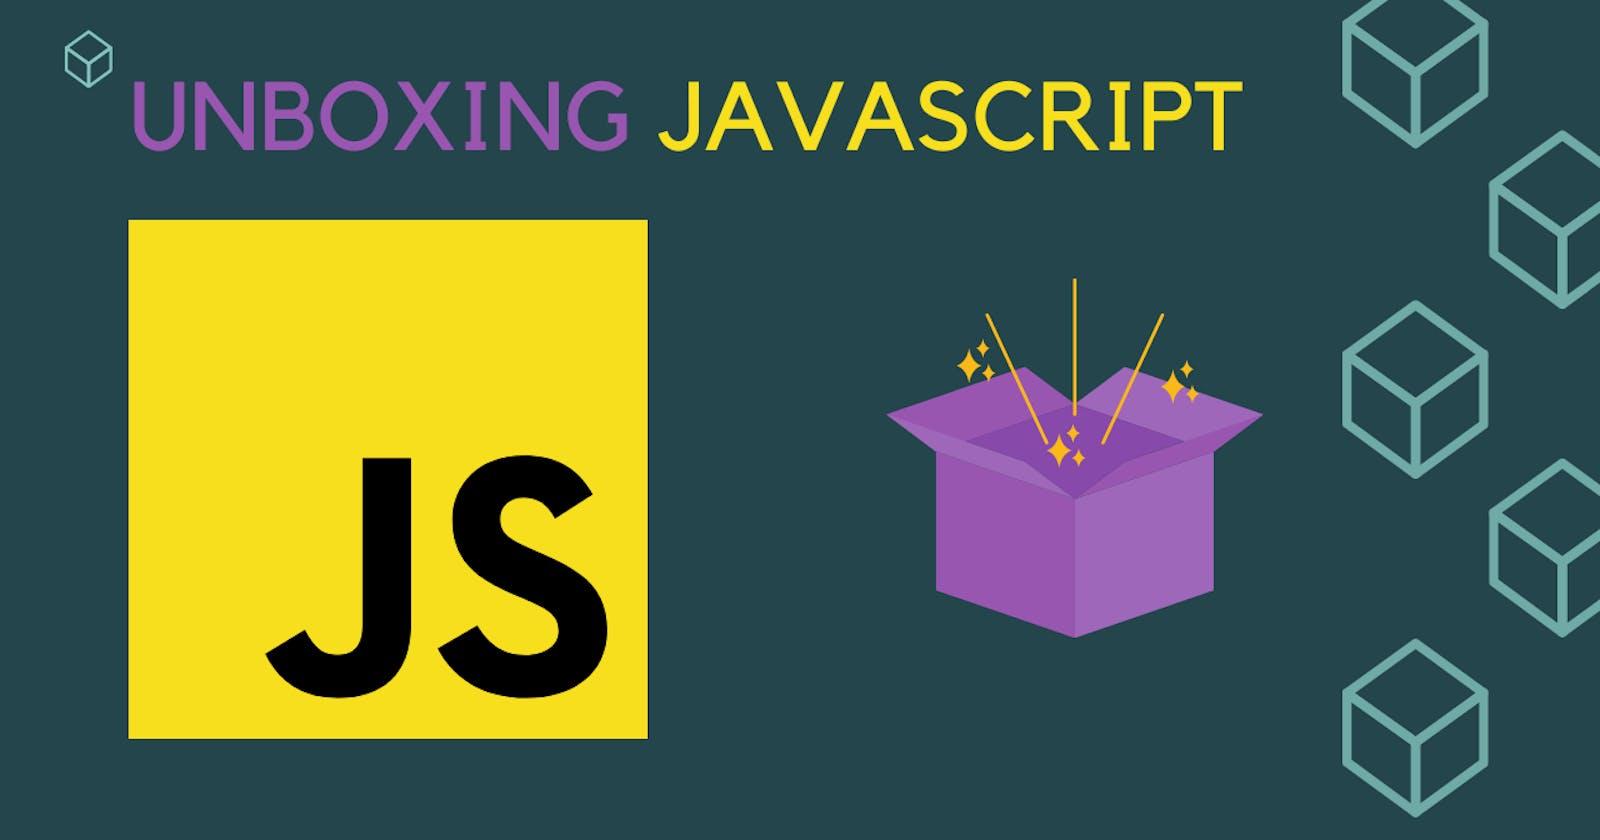 Unboxing JavaScript